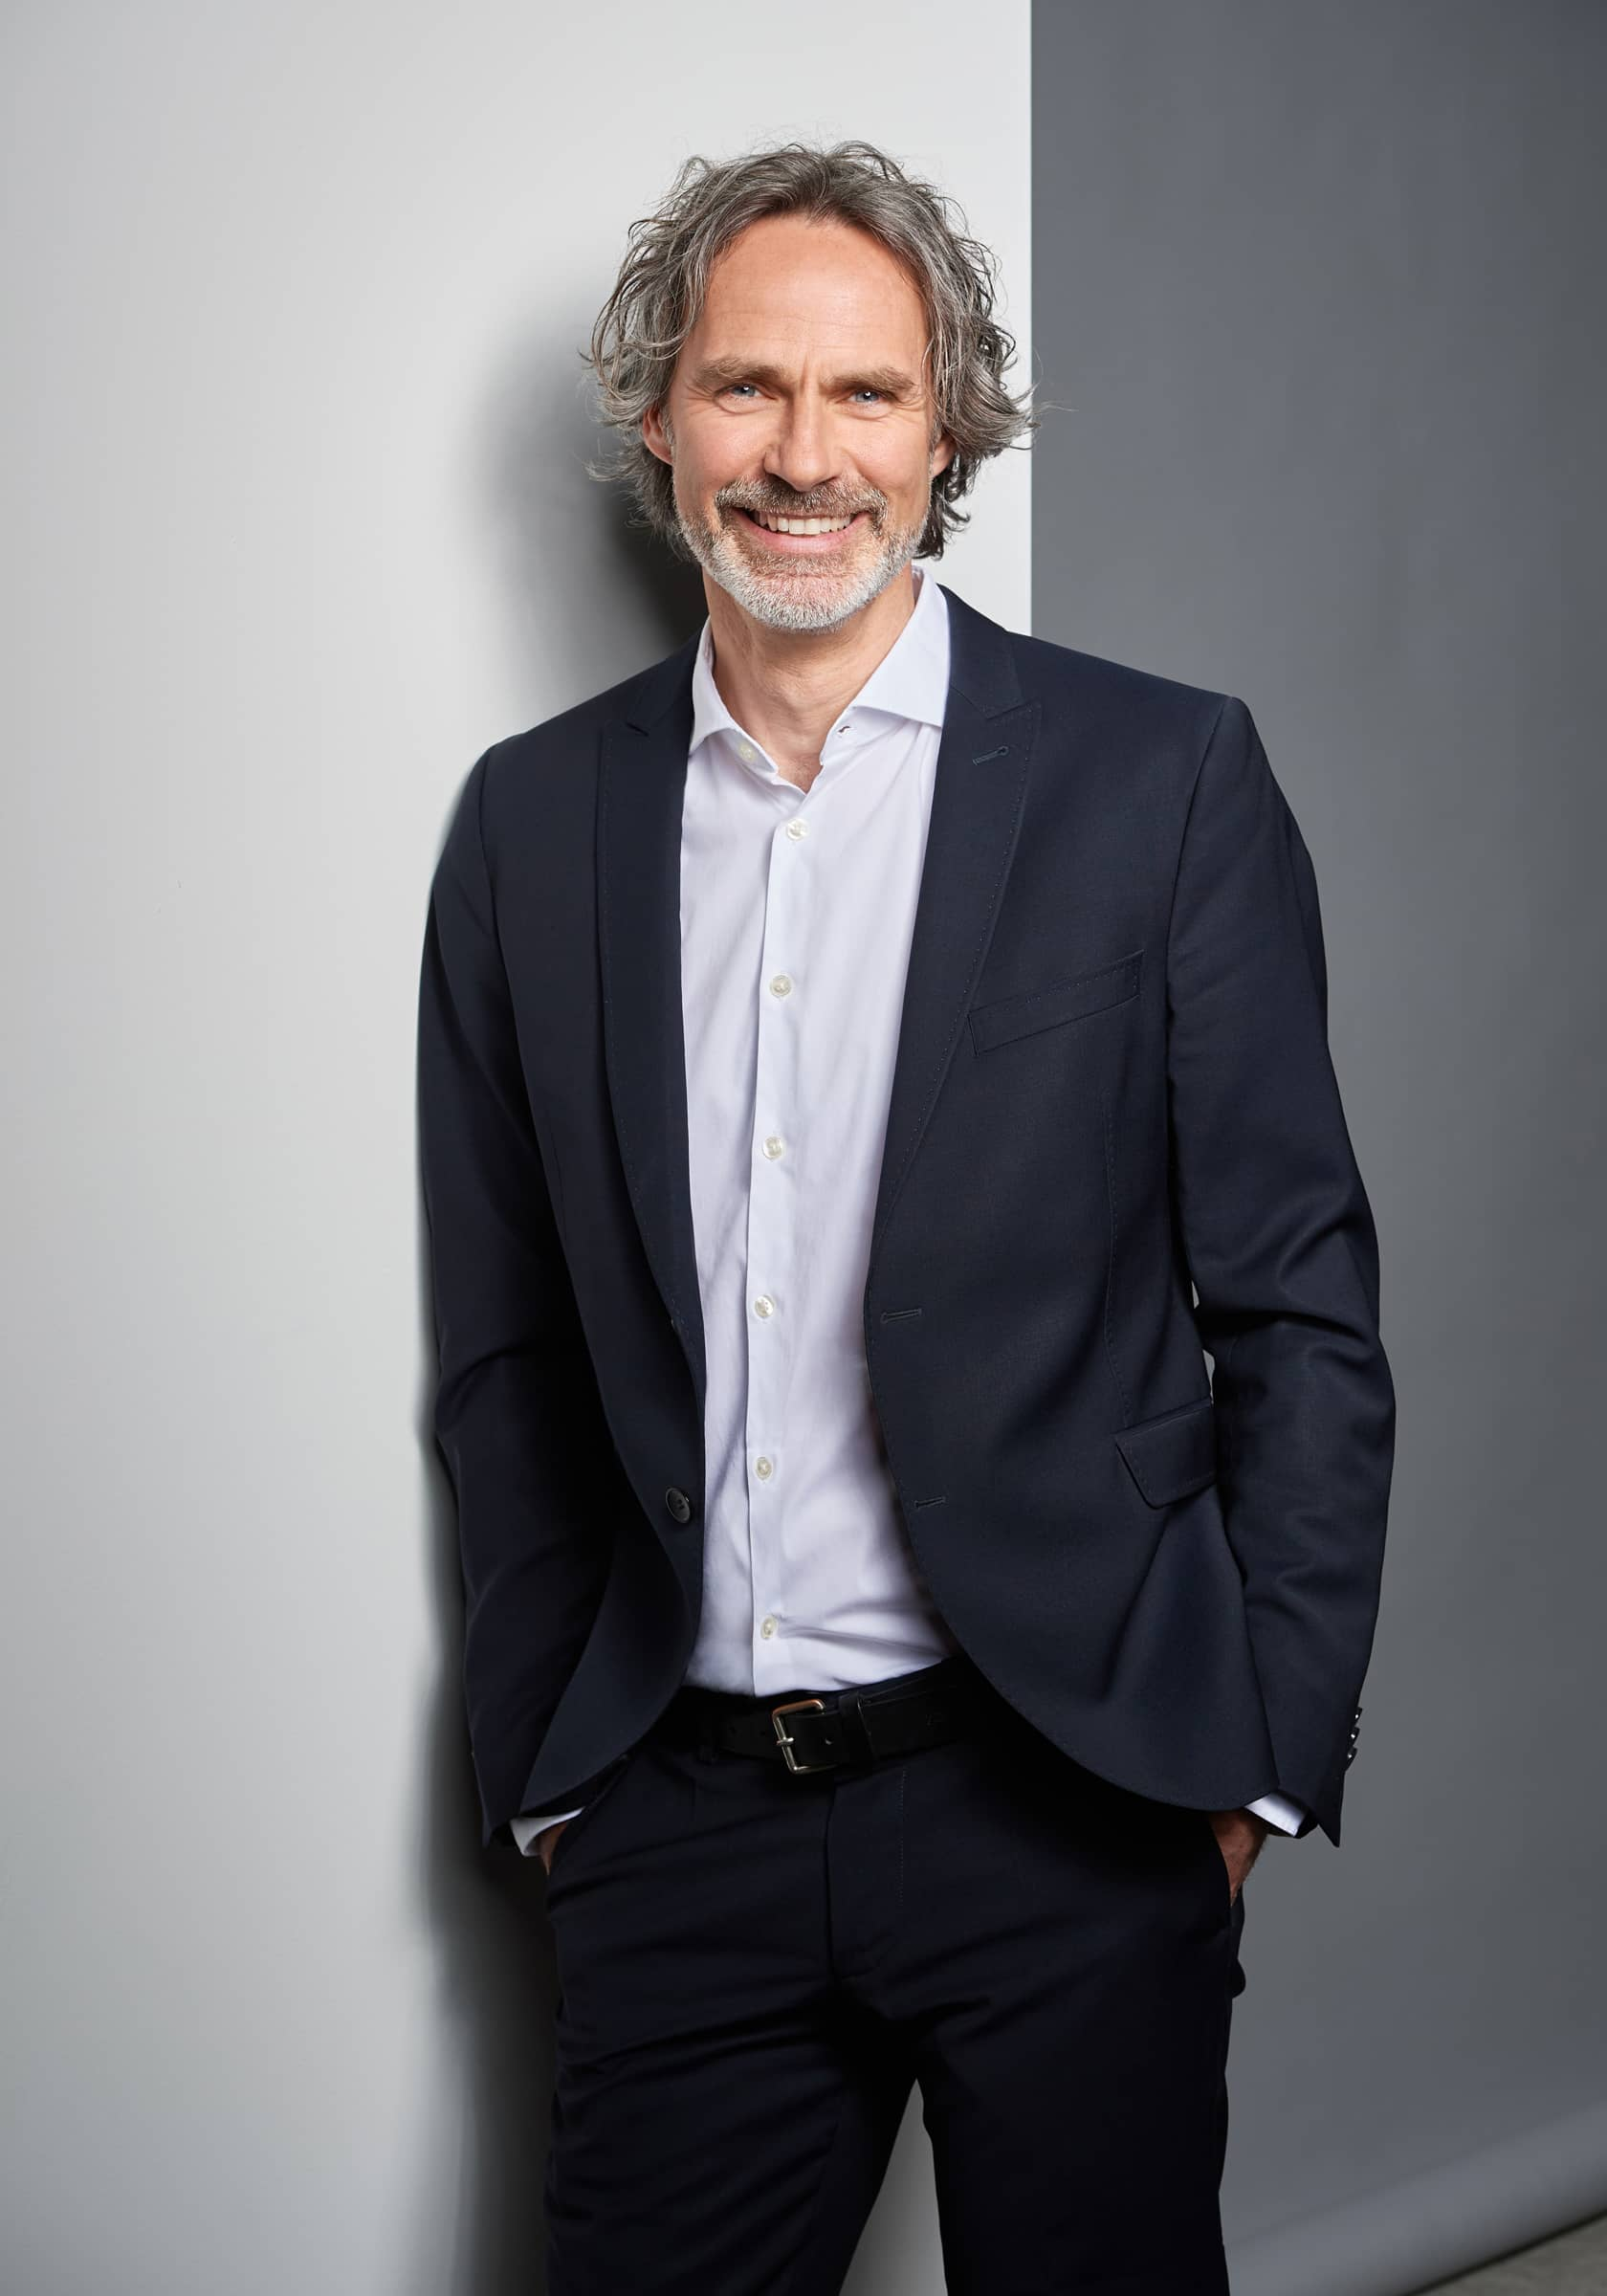 Dr. Thorsten Meis